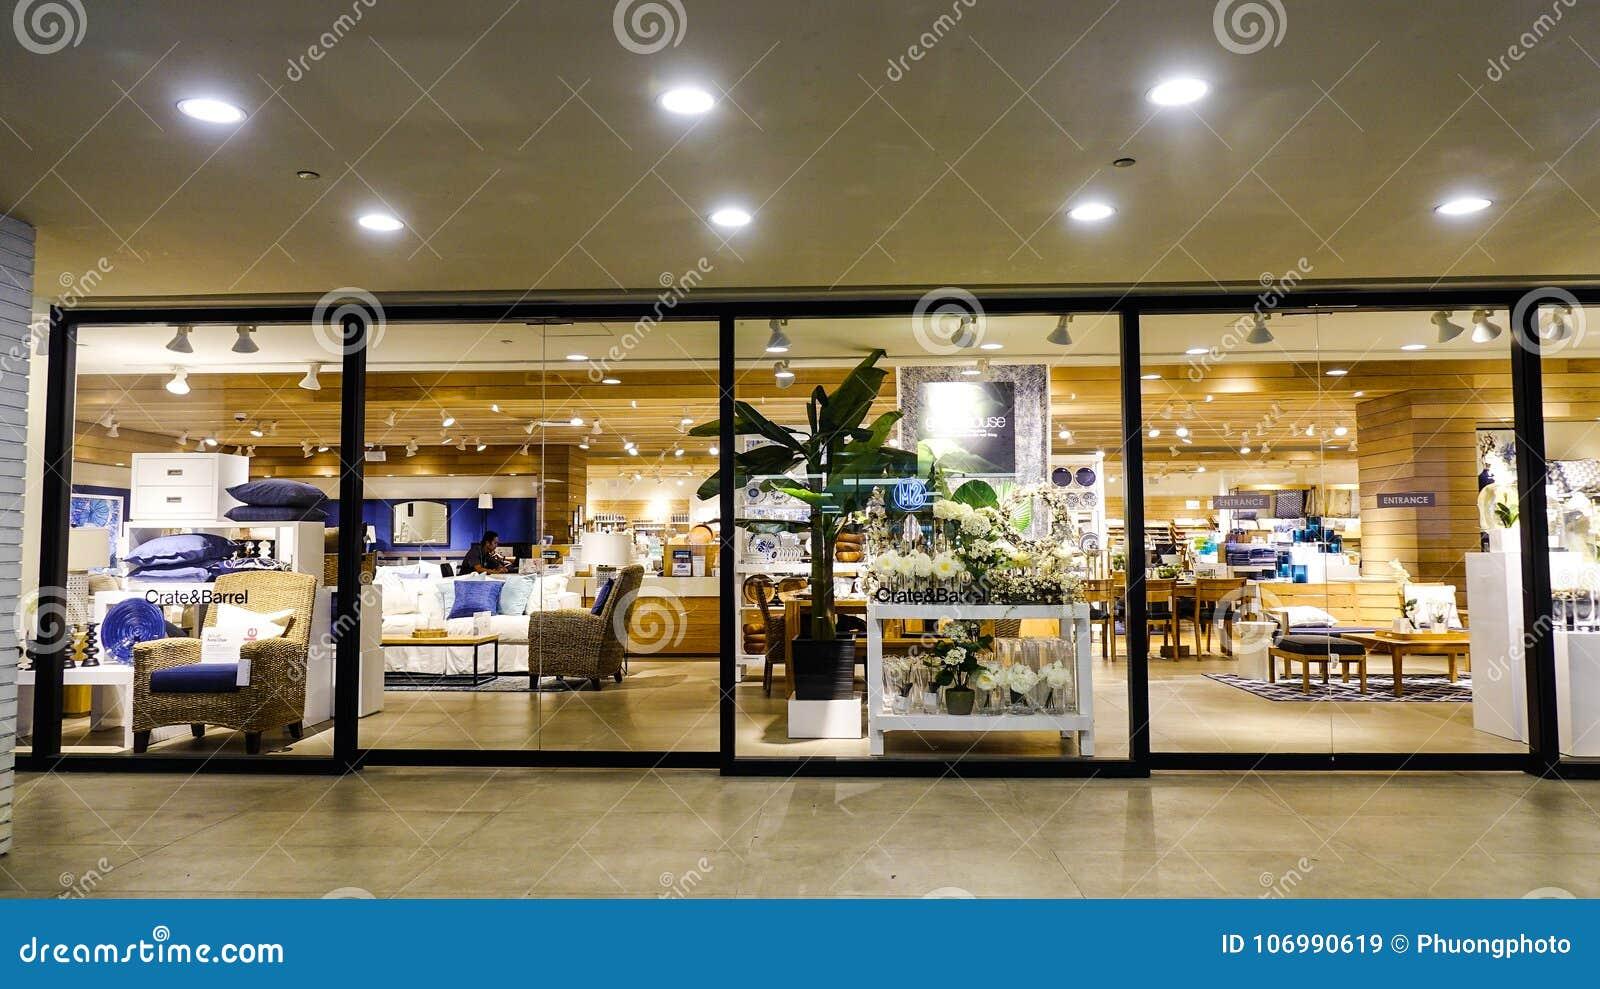 Furniture Store In Manila, Philippines